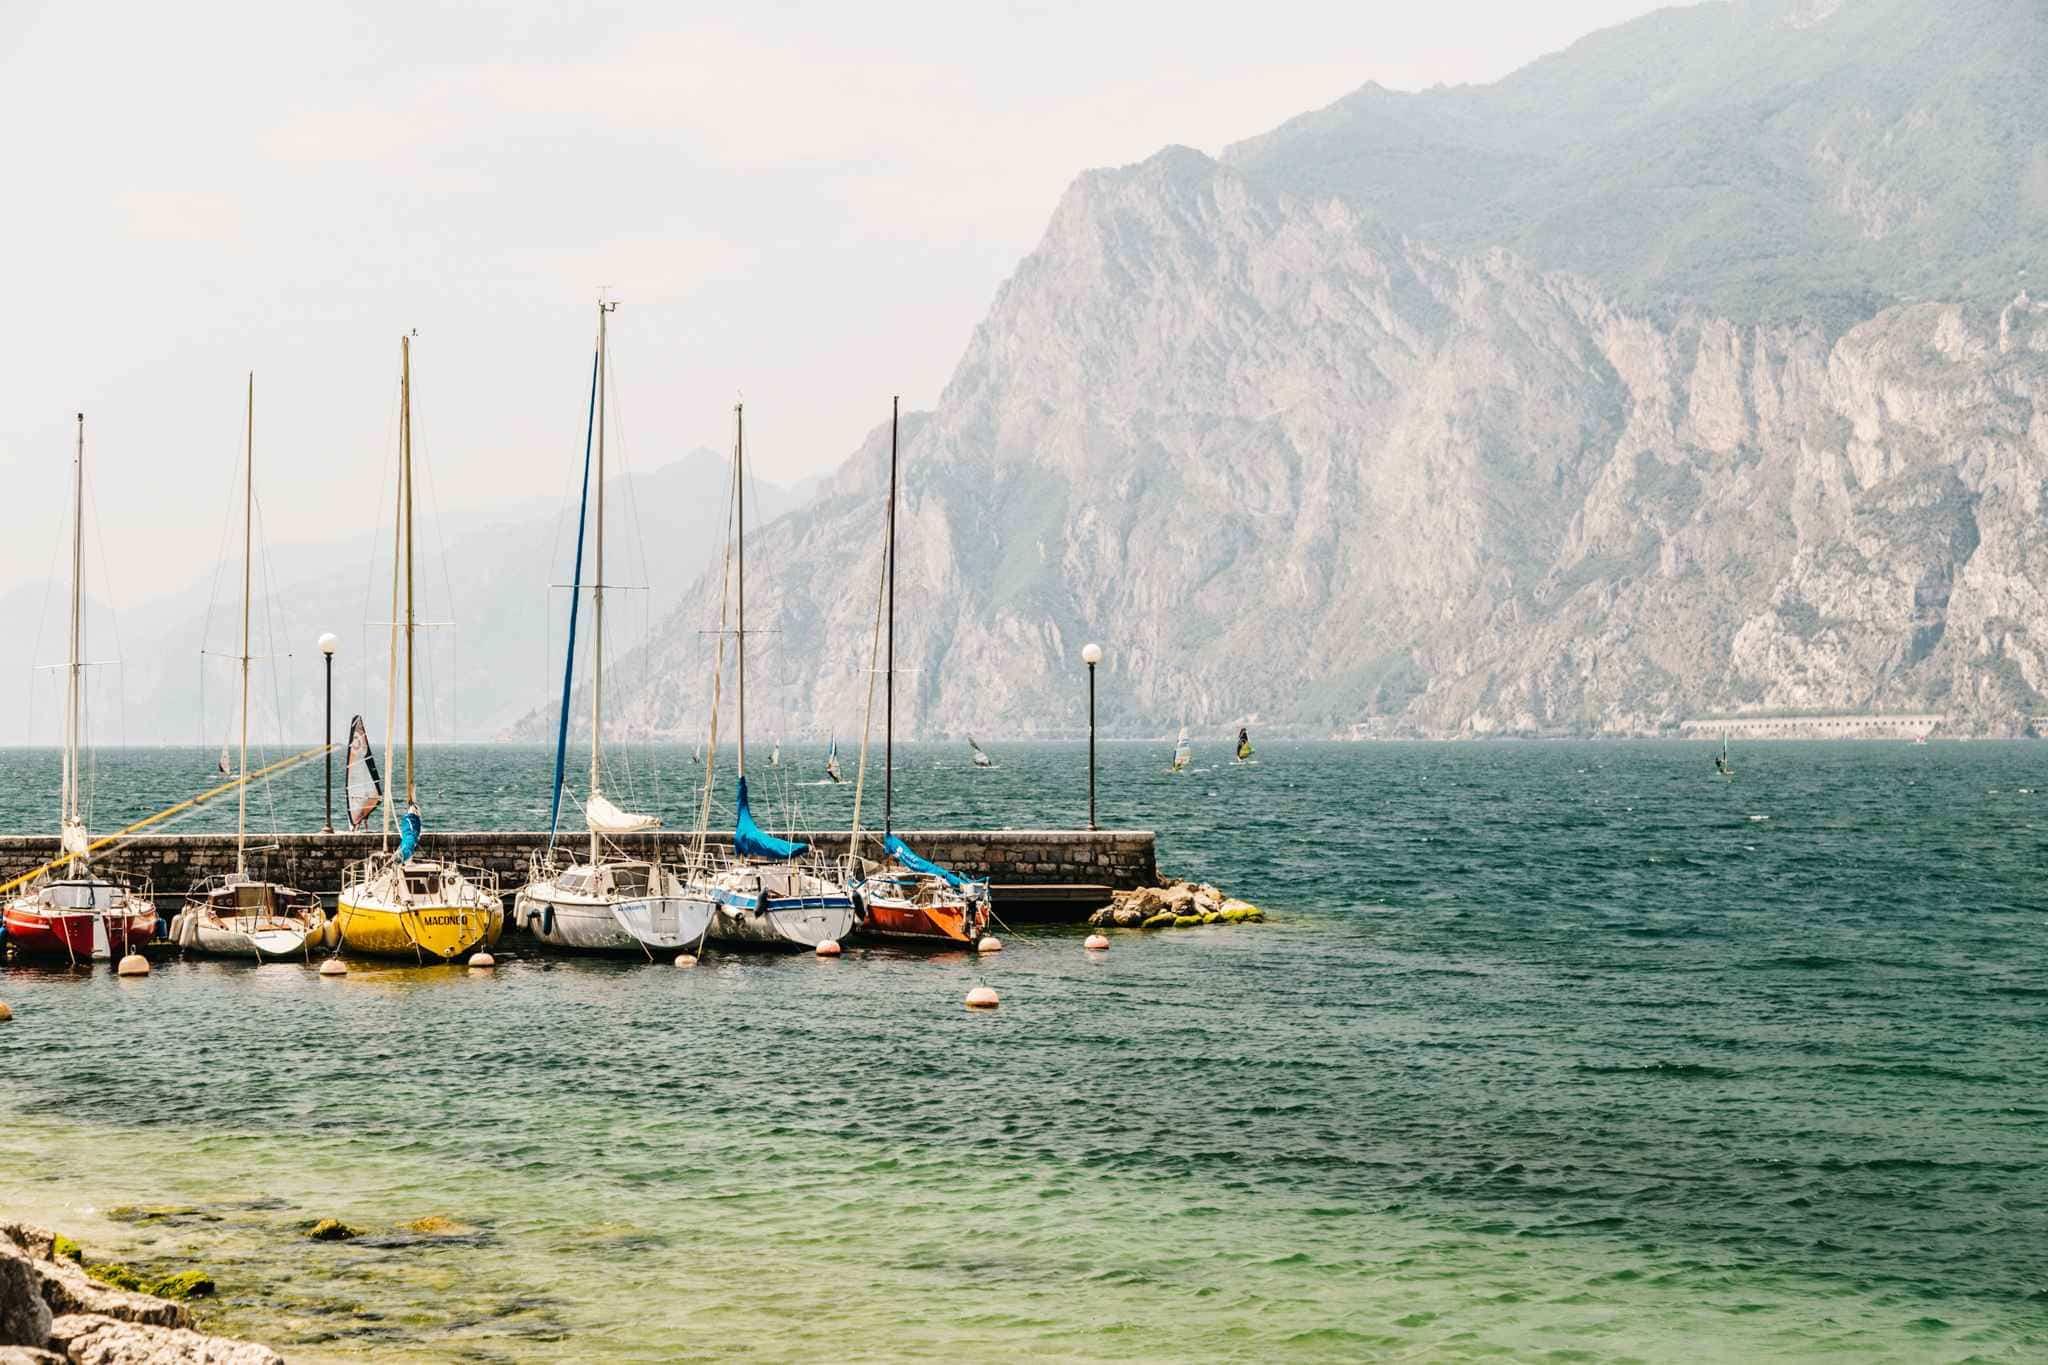 lake garda, lago di garda, one day in lake garda, italy's lake district, italian lake district, prettiest lakes italy, alternative to lake como